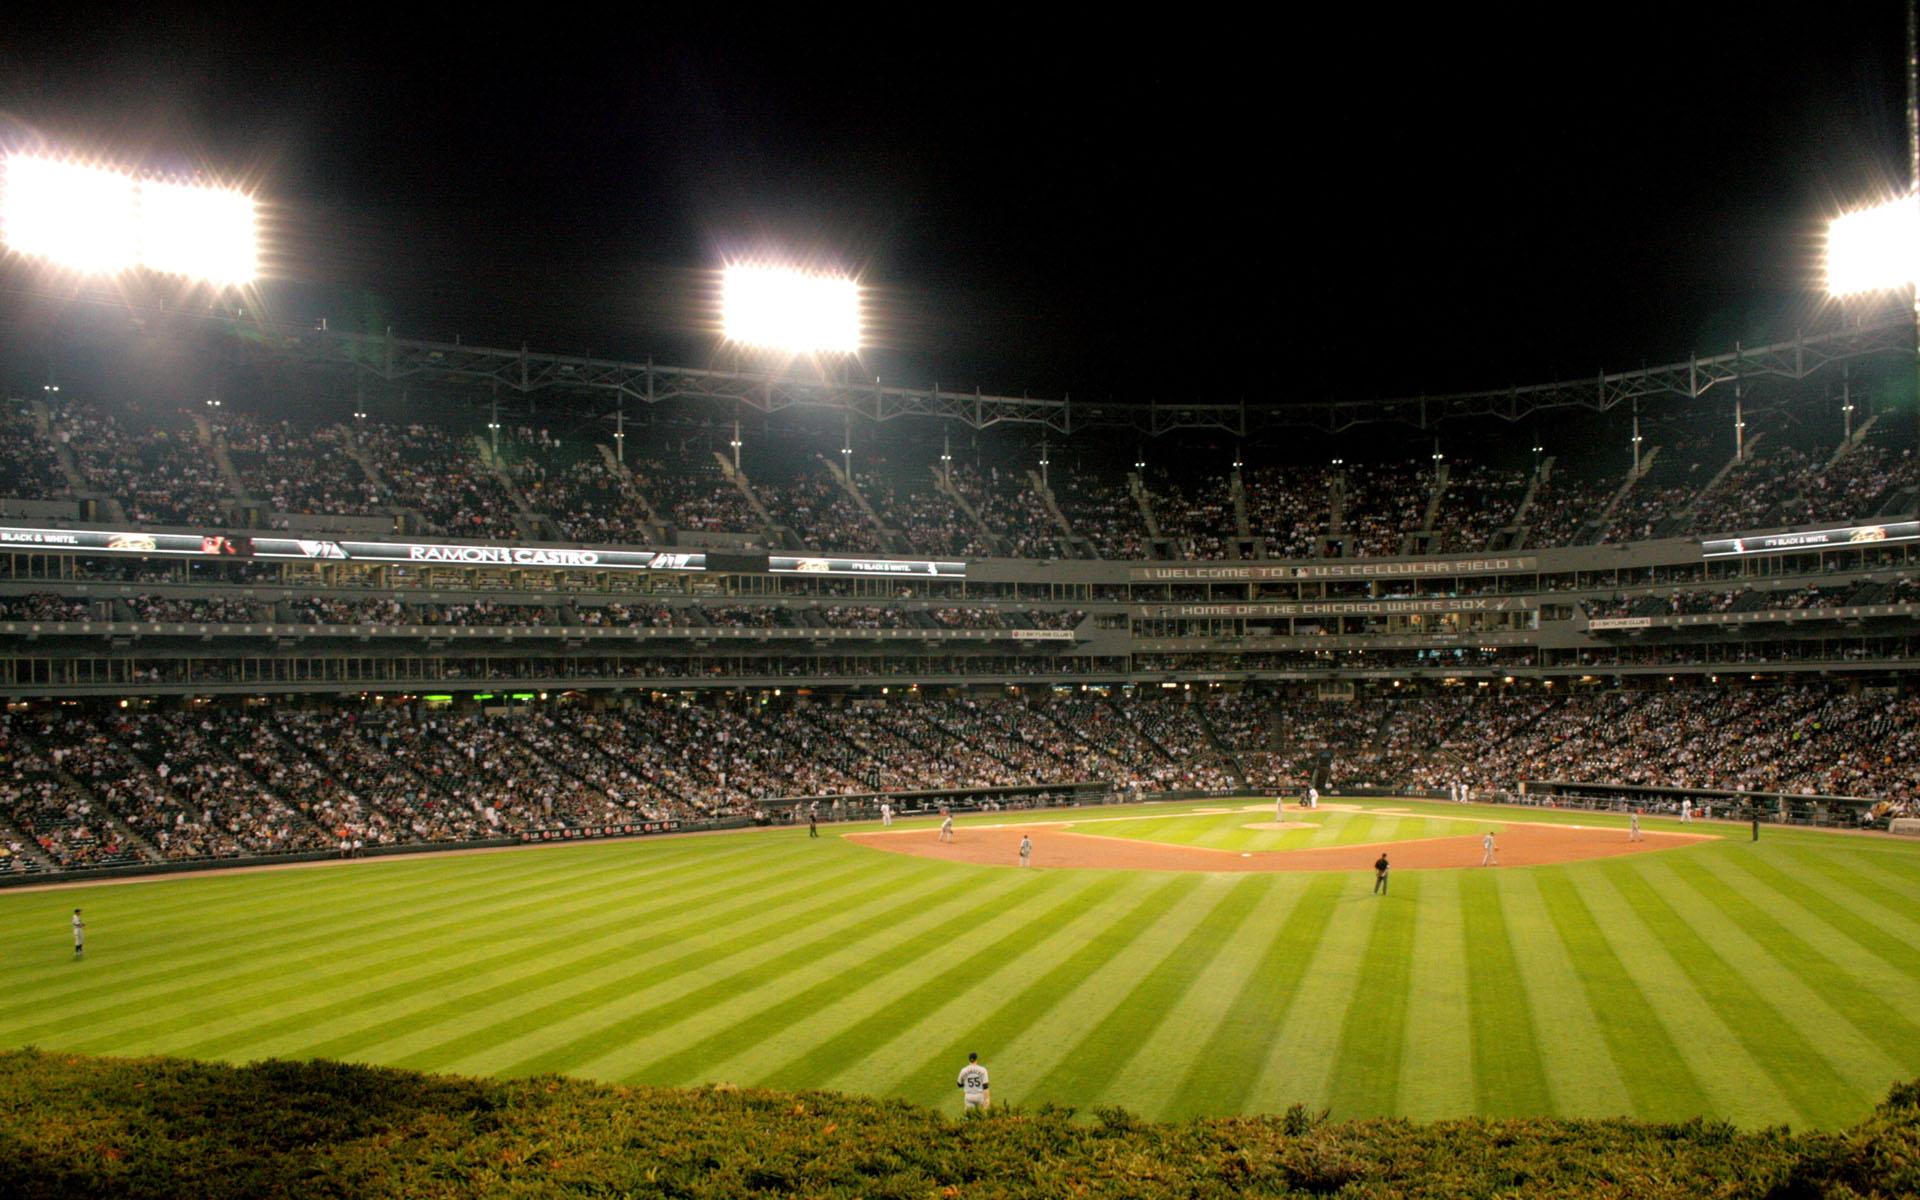 hd desktop wallpaper baseball - photo #20